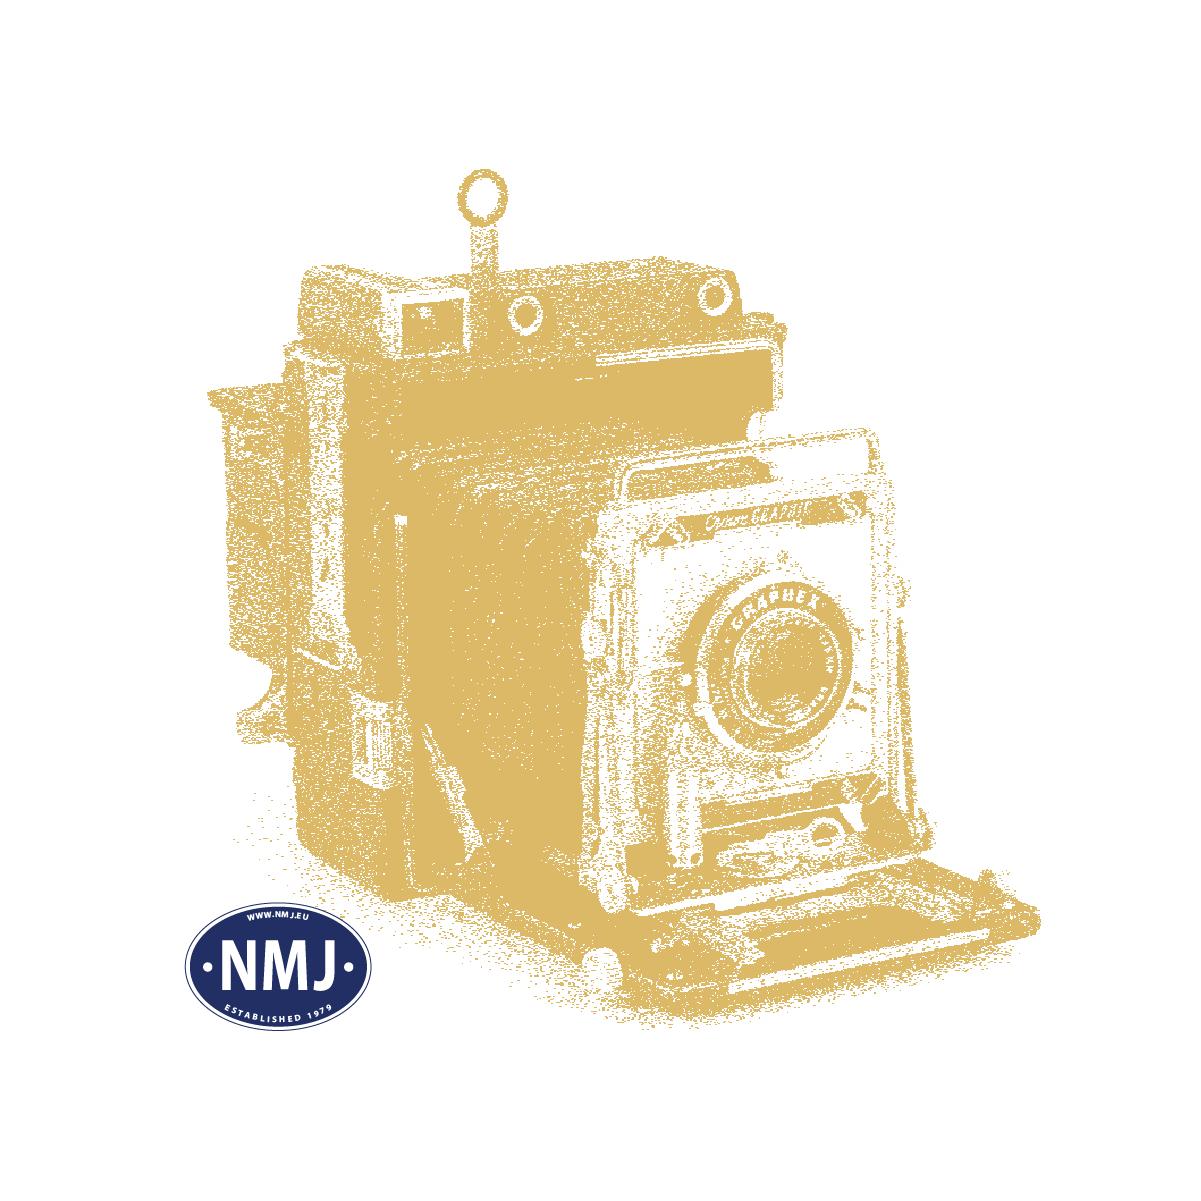 NMJ0G4-3 - NMJ Superline NSB Gbkls 20 76 158 5796-9, 0-Scala